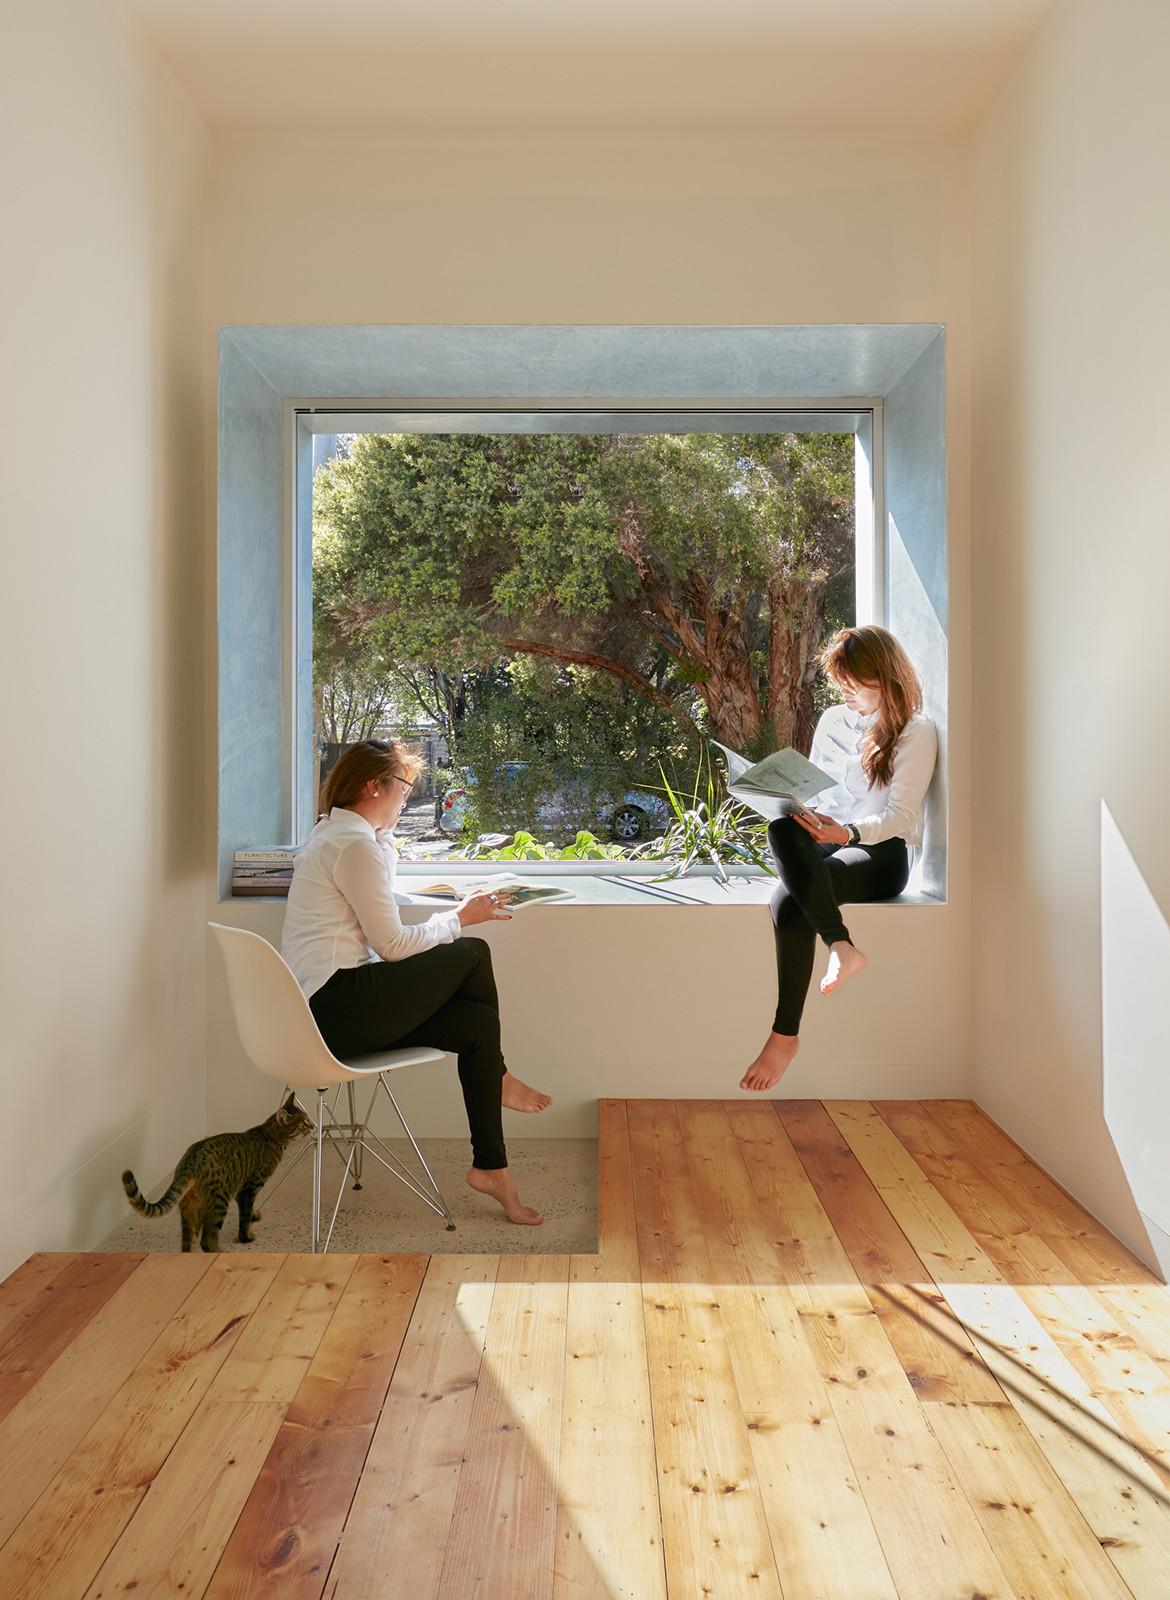 Taranaki Rift House Architecture Architecture window bench